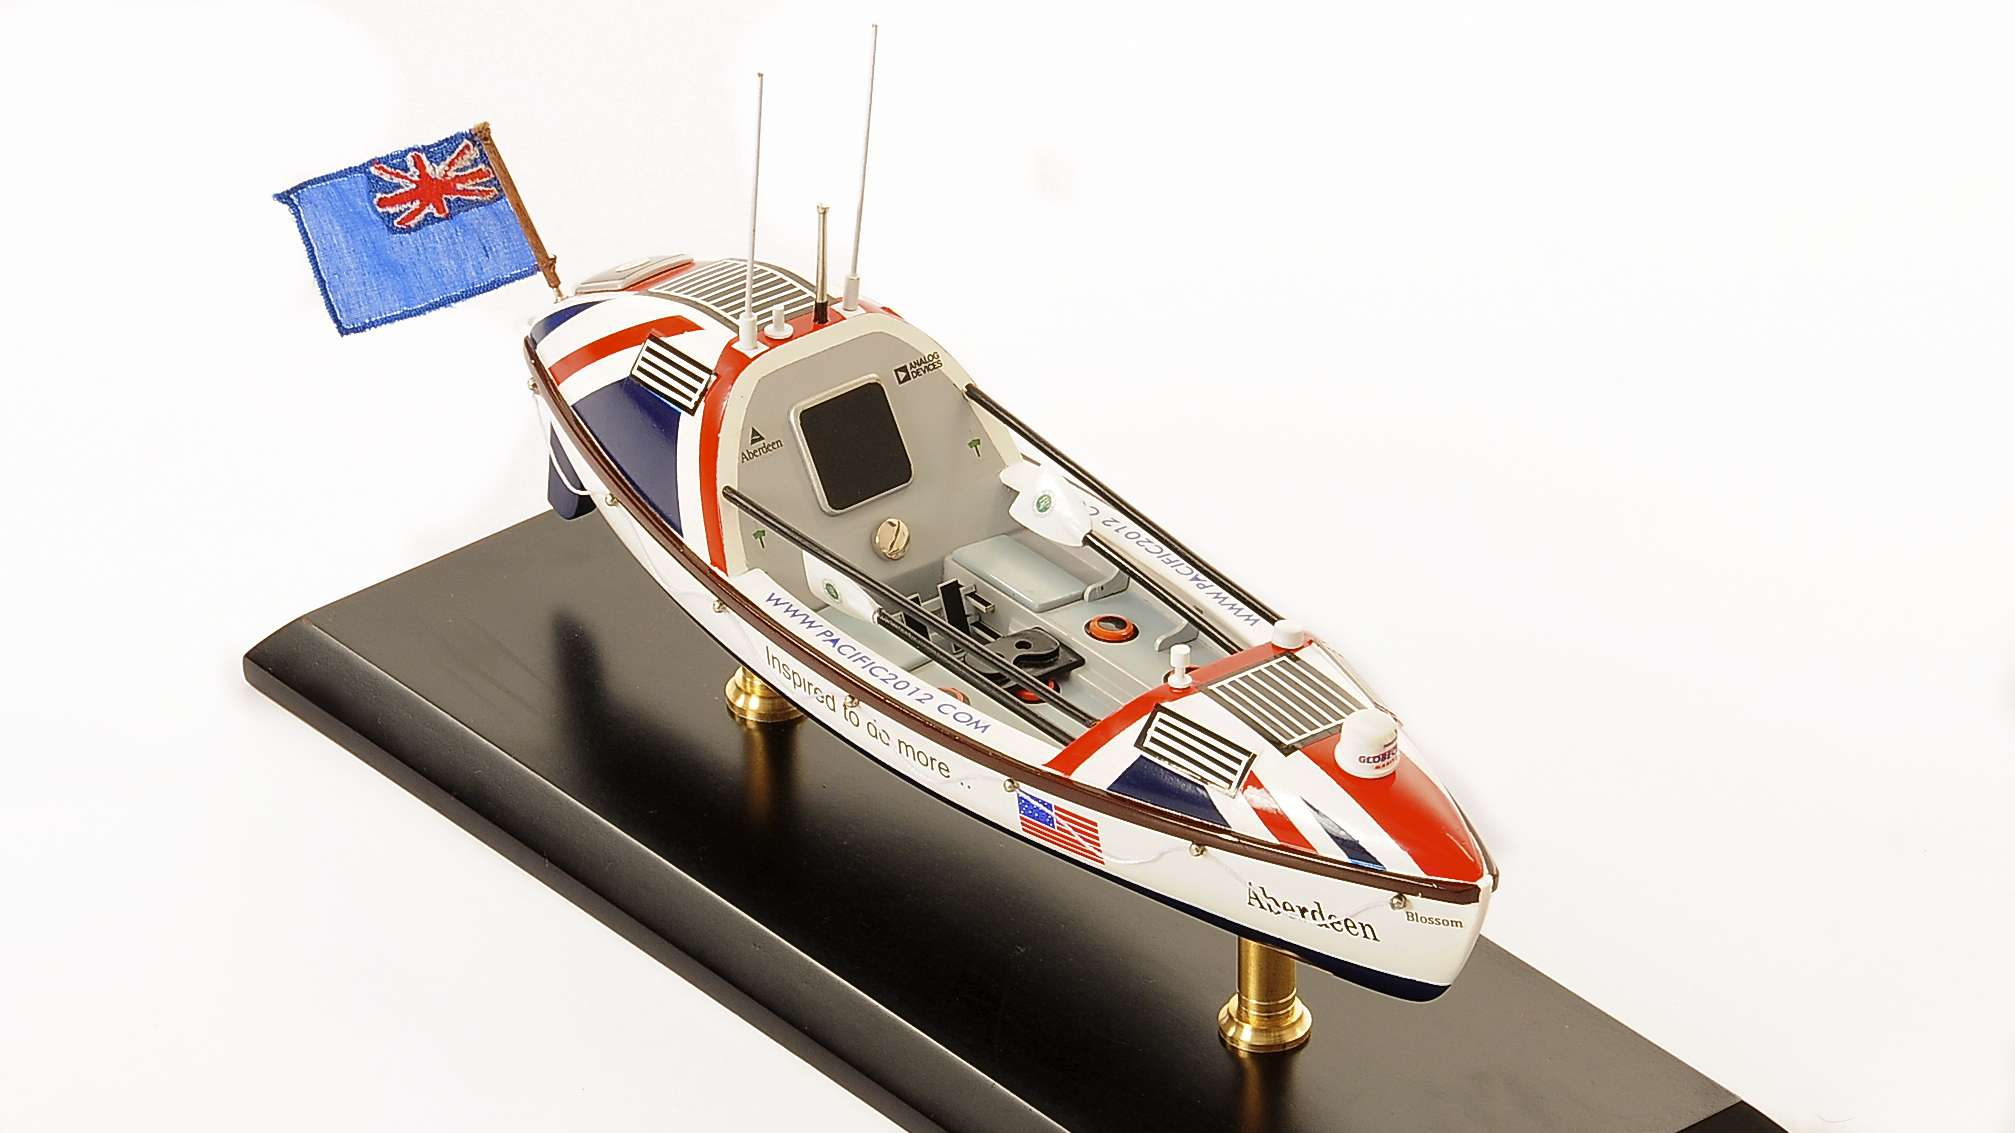 1472-4284-Blossom-Endurance-Solo-Rowing-Boat